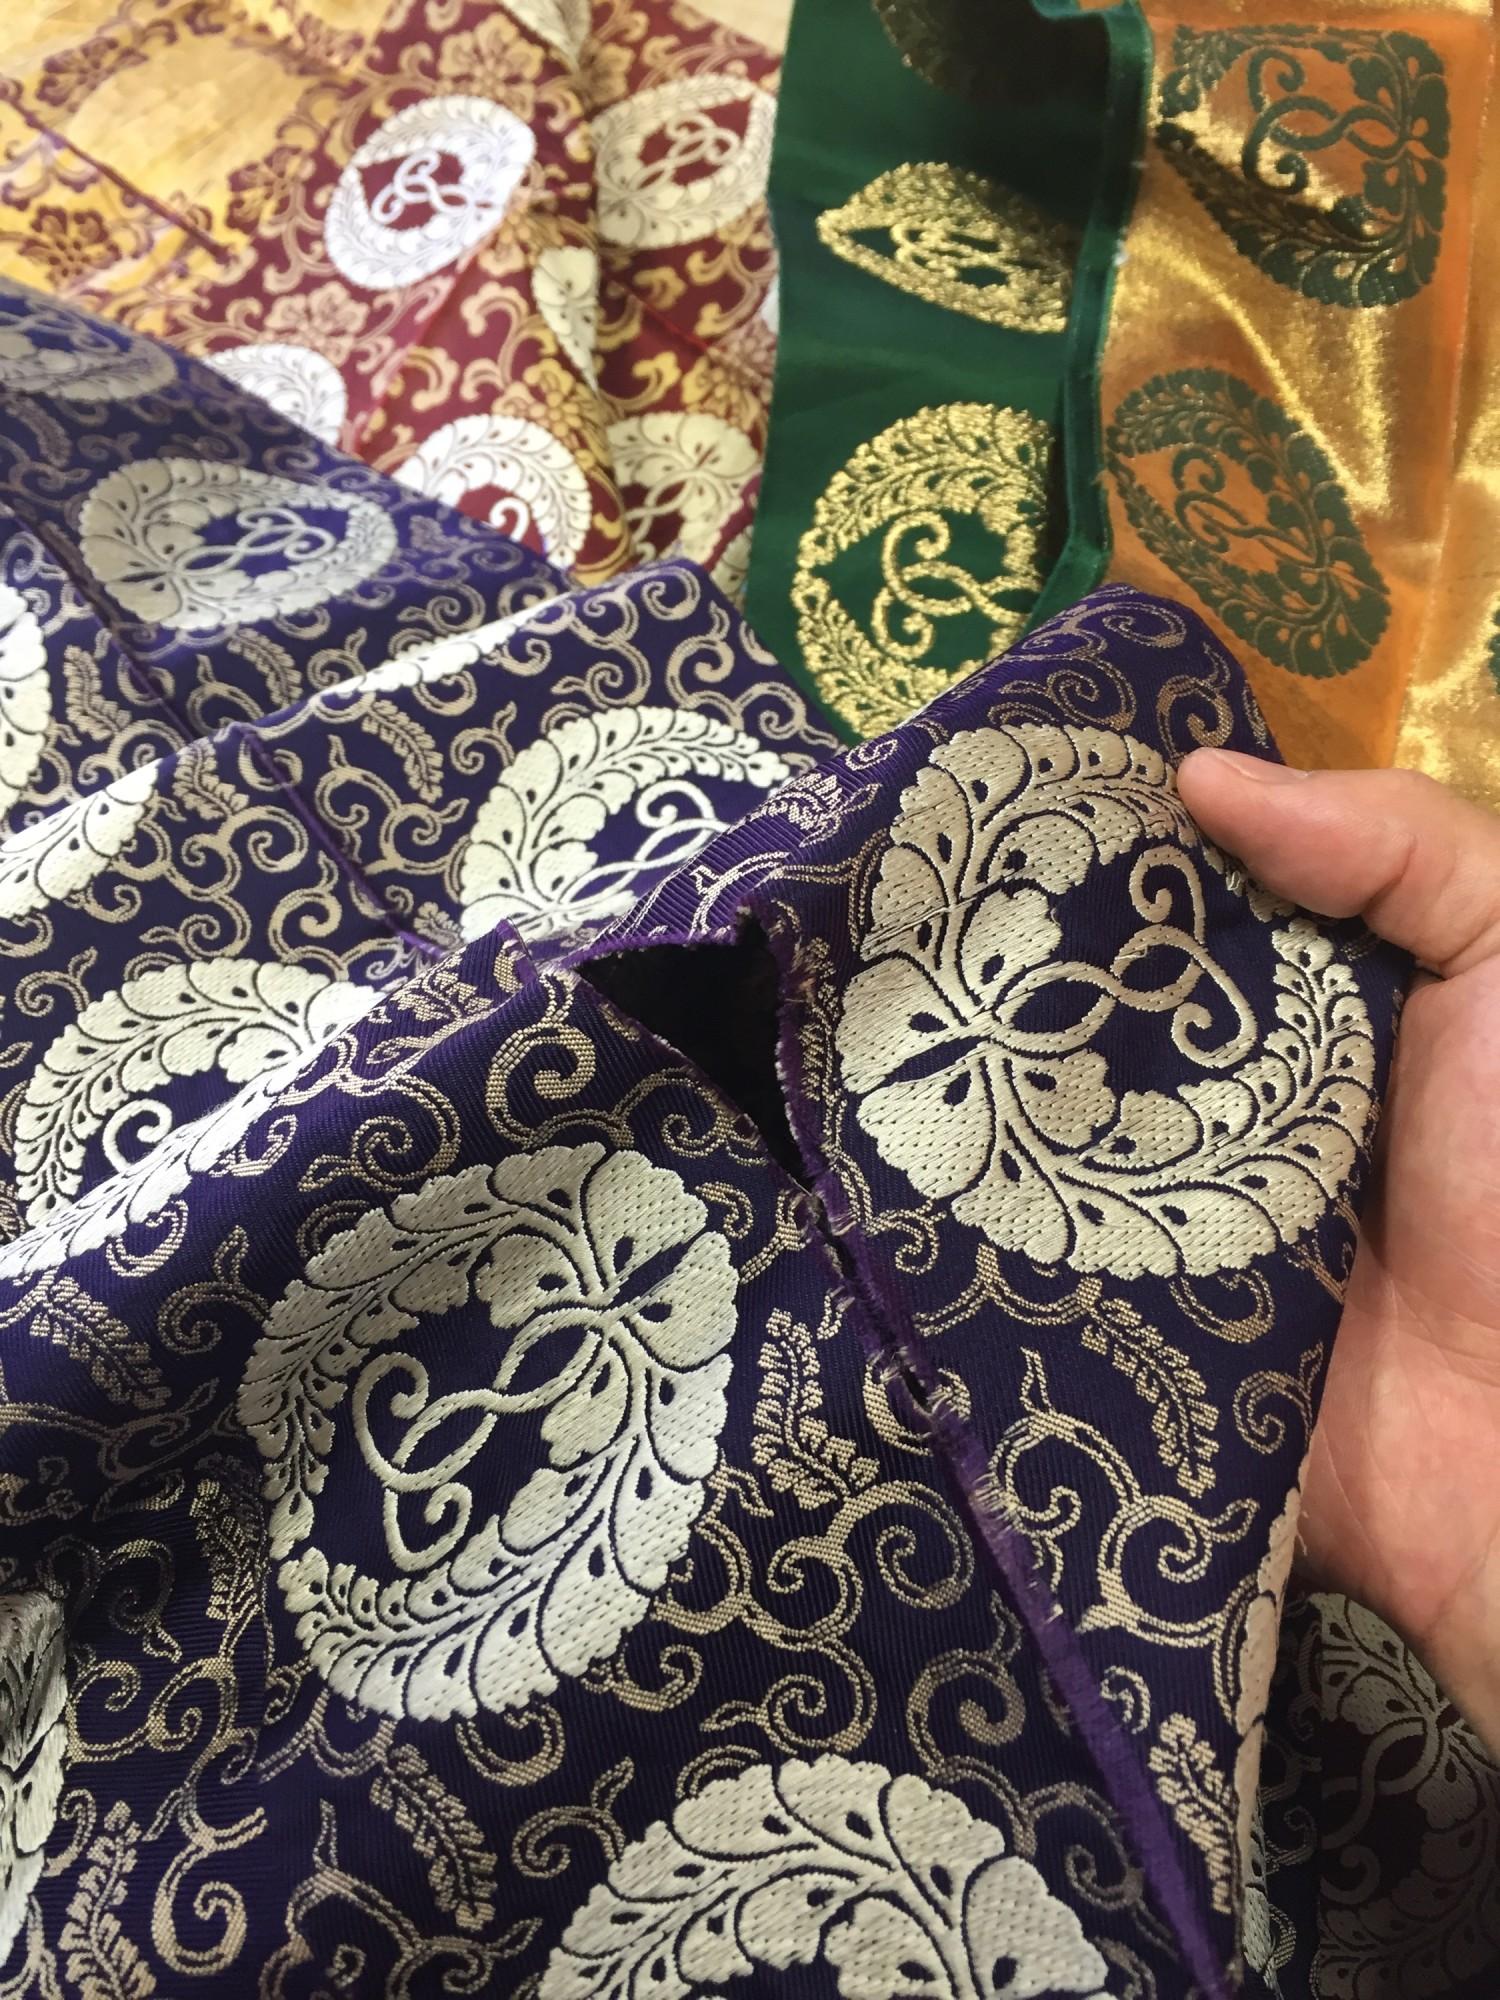 Buddhism kyoto tradition naoshichi fabric repair 五条袈裟修繕 川勝直七